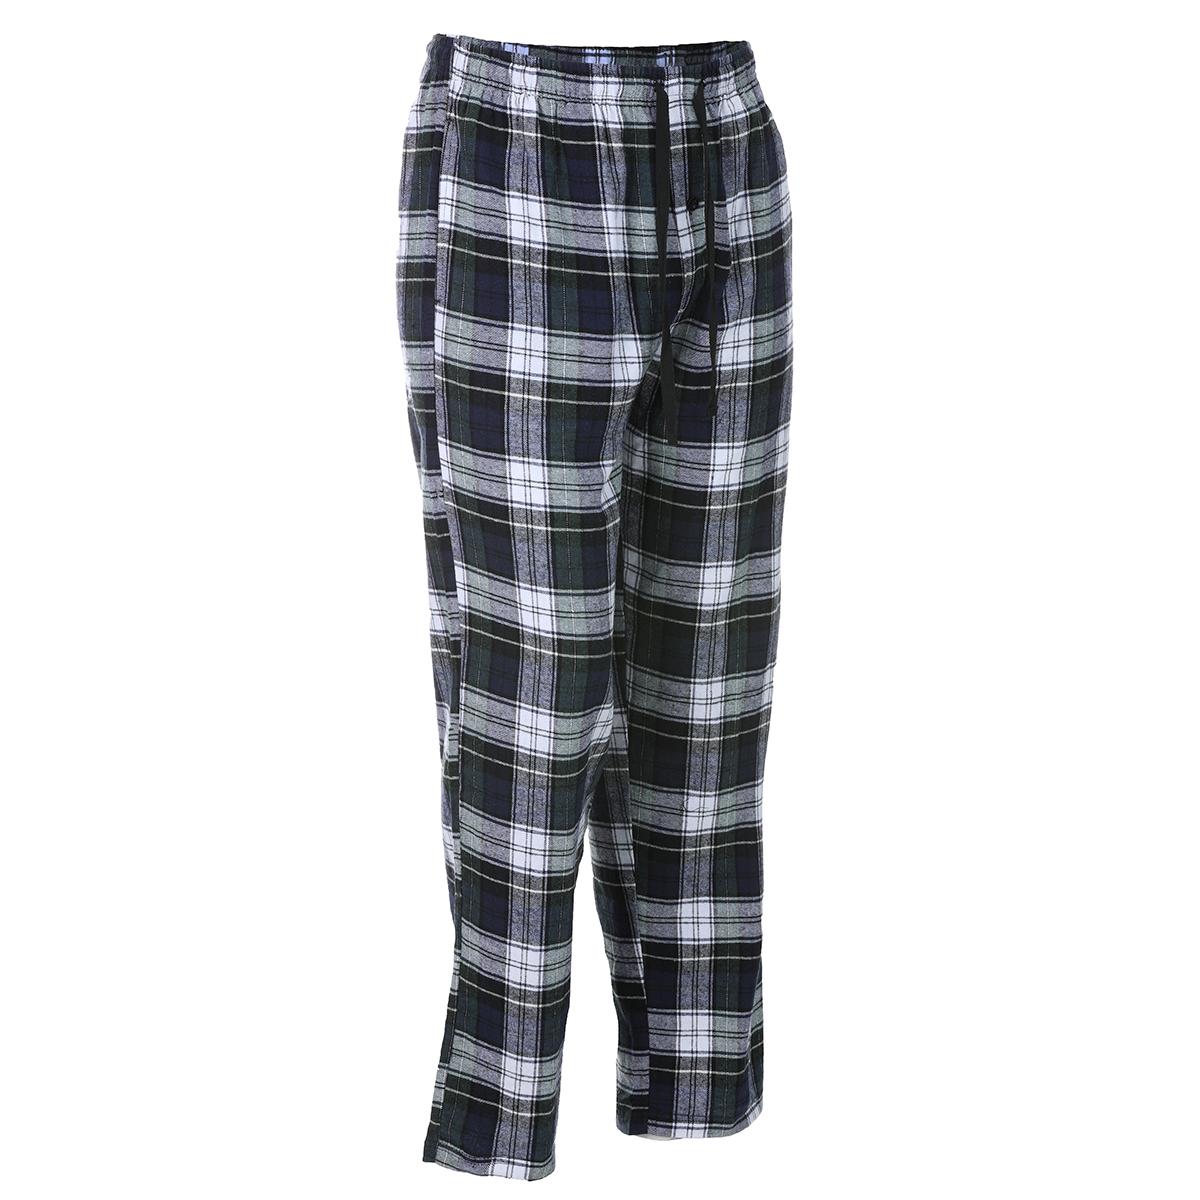 Ems Men's Flannel Lounge Pants - Green, M